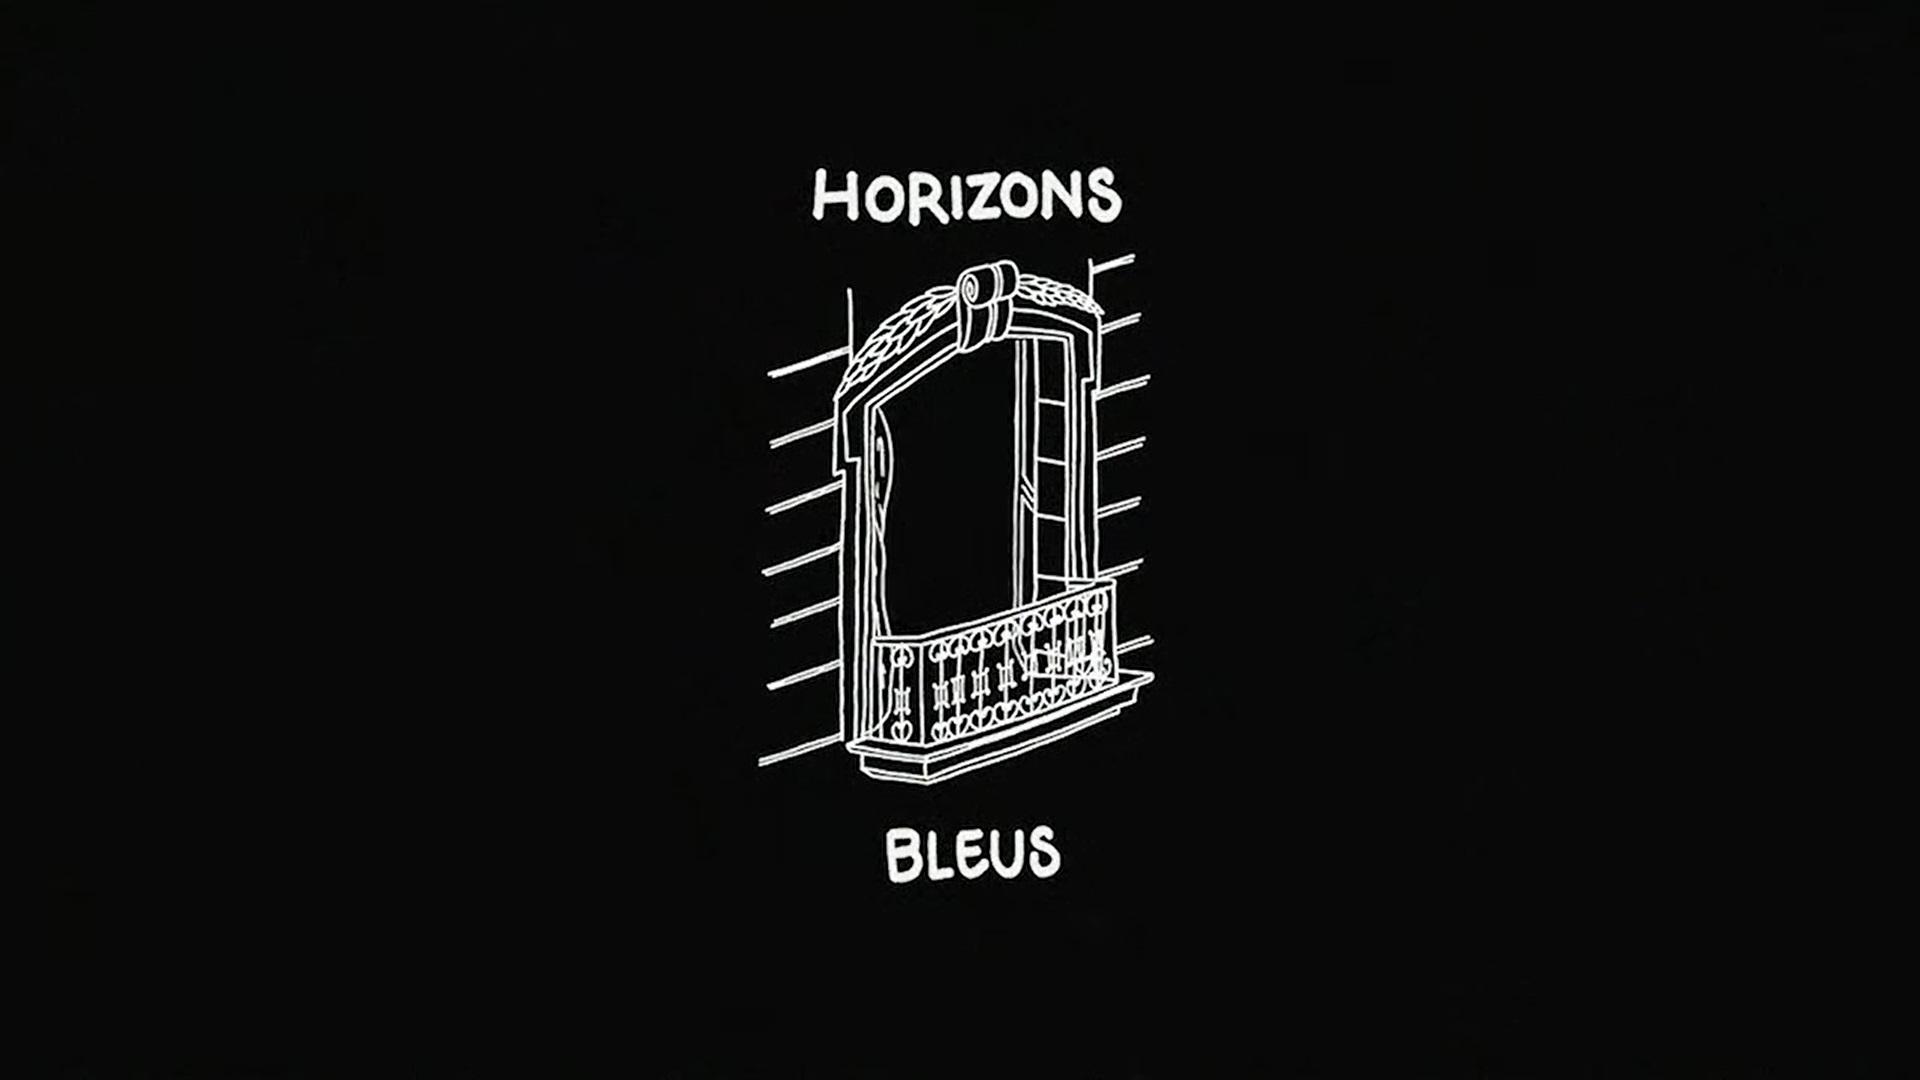 Horizons bleus